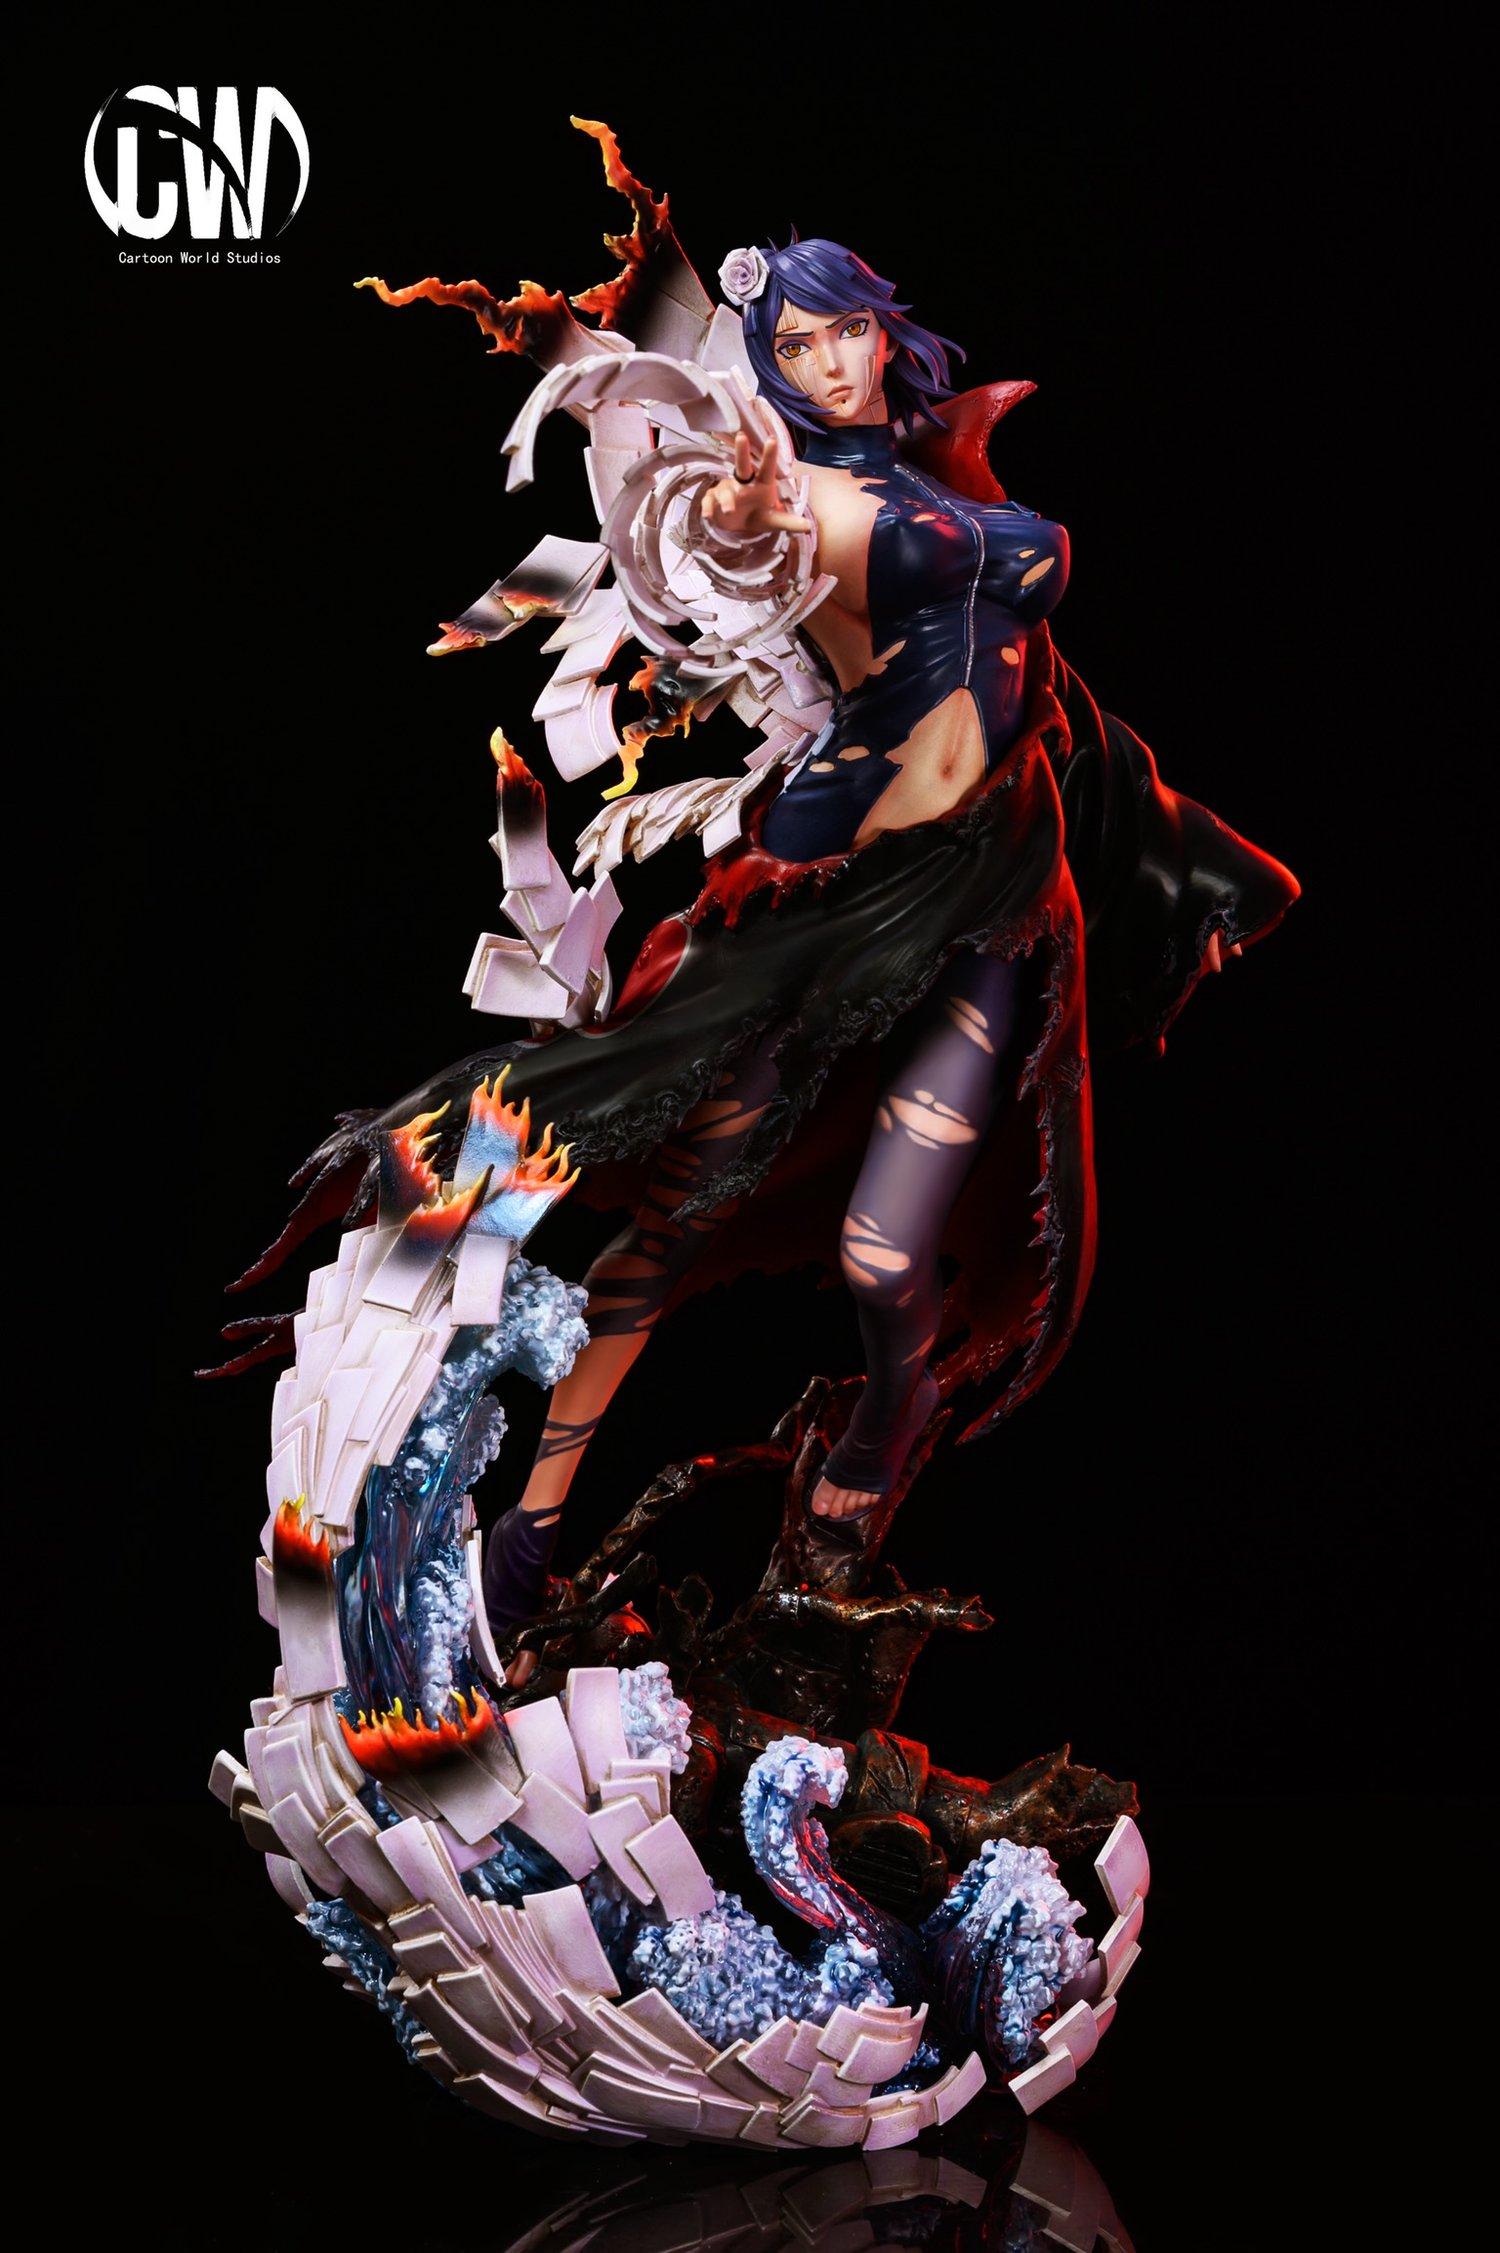 Image of [Last-Stock]Naruto CW Studio Battle Damaged Series Vol.2 Konan  Resin Statue